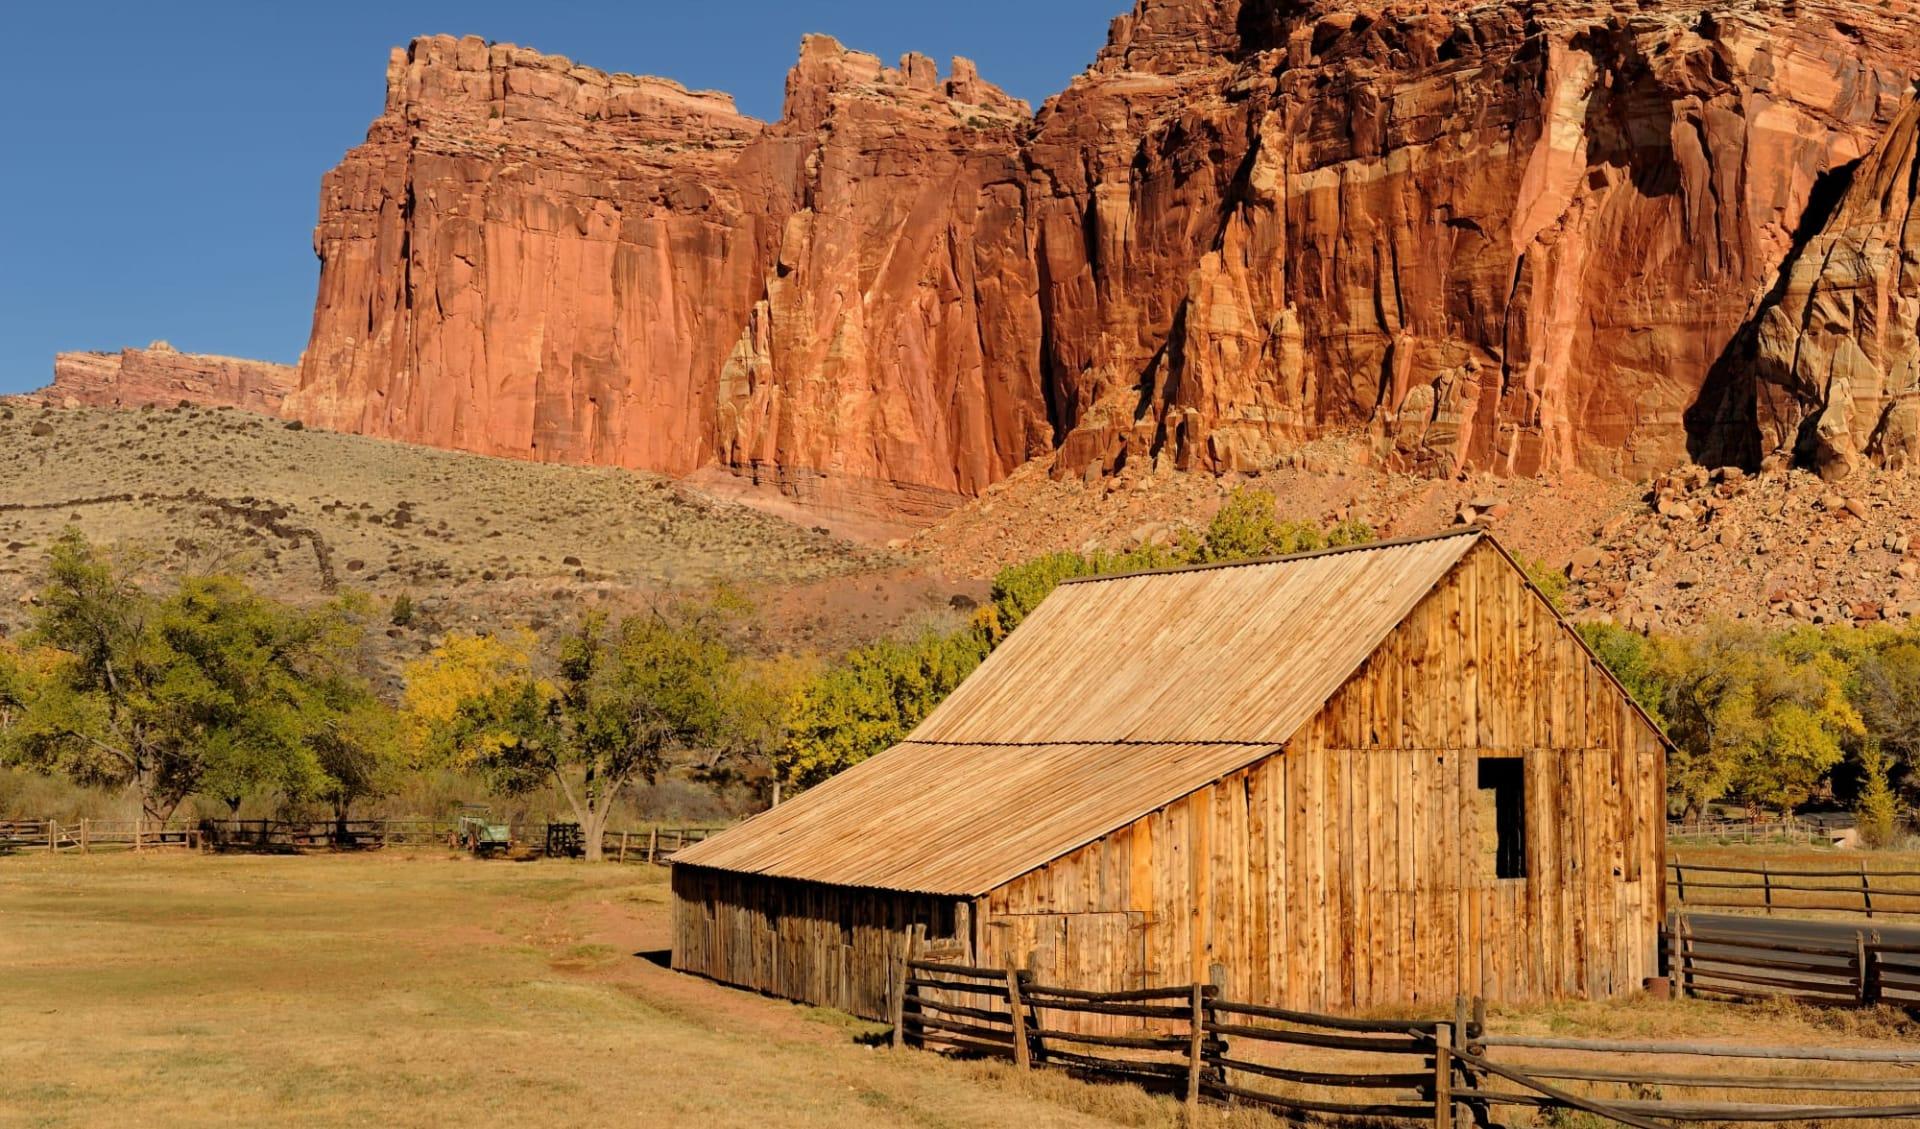 Nationalparks Explorer Extended ab Las Vegas: shutterstock_88636306_Barn Capitol Reef NP